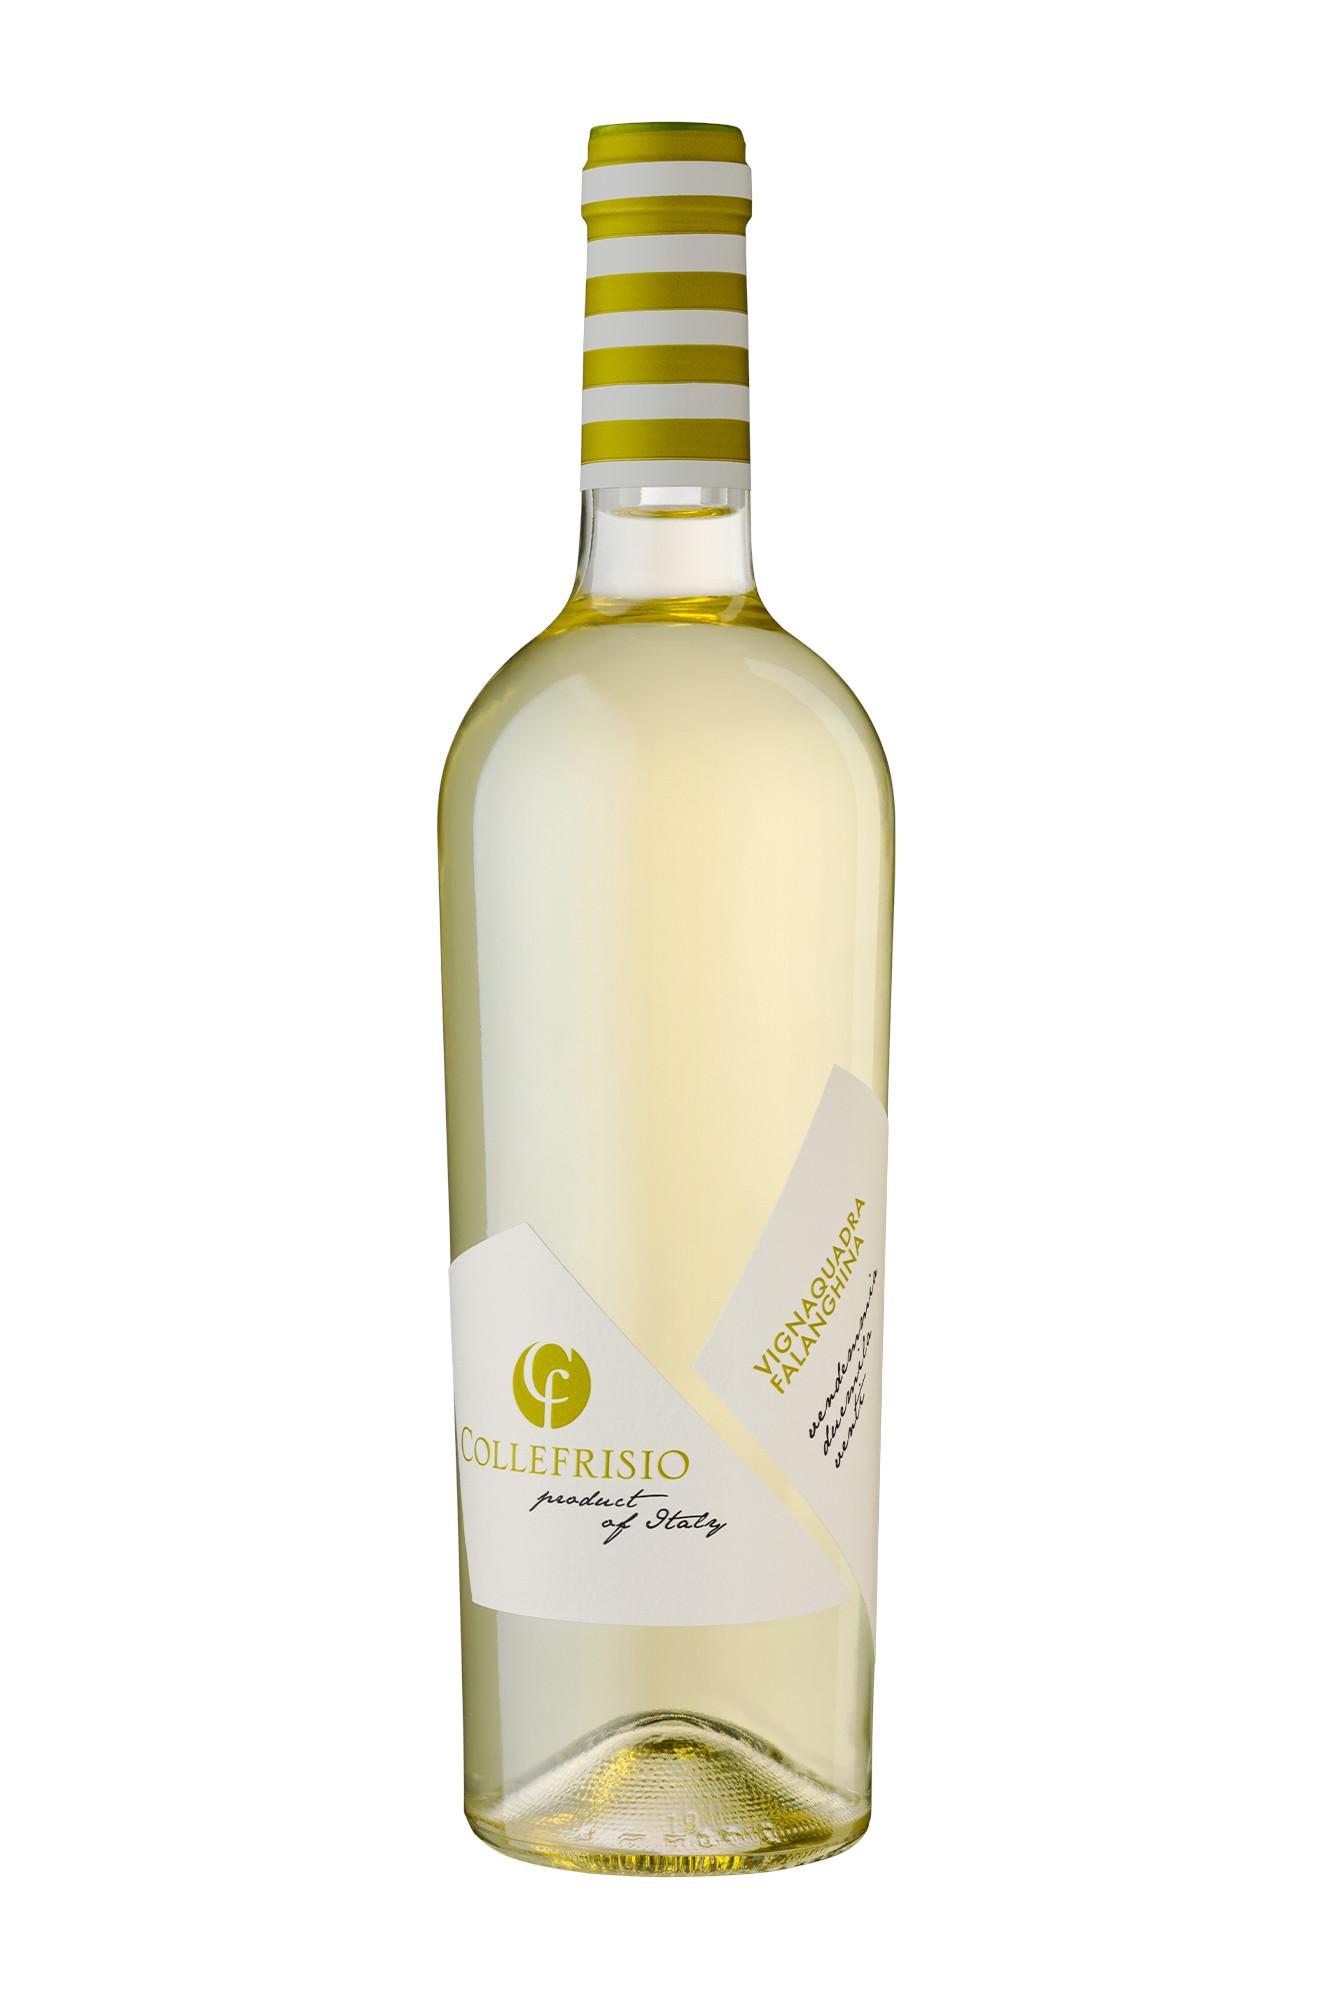 collefrisio-vini-bianco-vignaquadra-falanghina-terre-di-chieti-igt-bottiglia